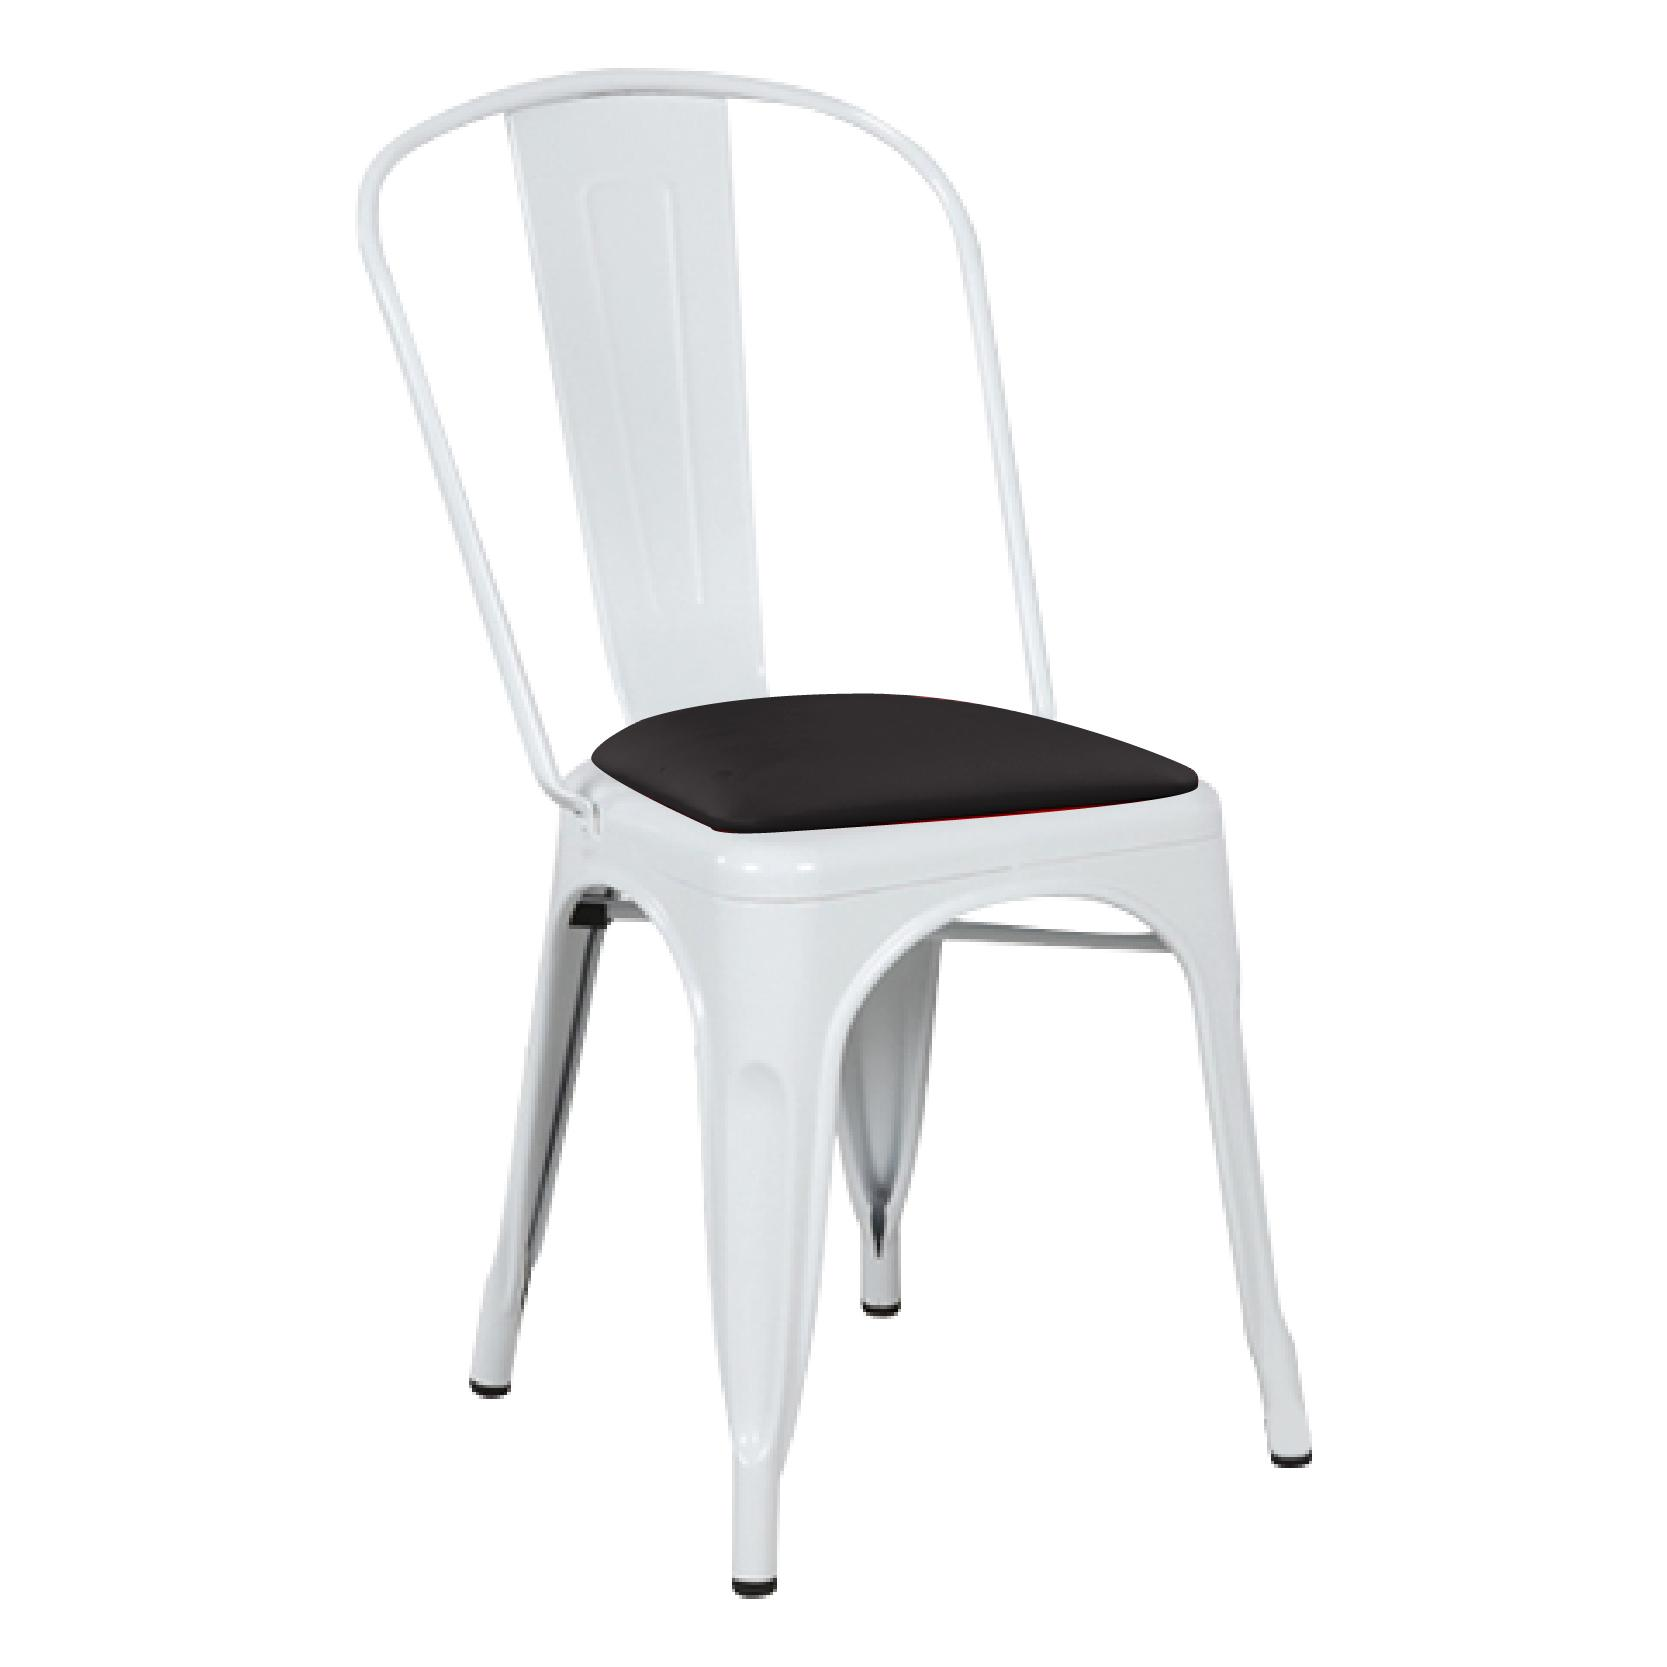 JIJI TOLIX Dining Chair (Self-Assembly) - Designer Chair / Metal Chair / Dining Chair / Chrome Metal Chair (SG)